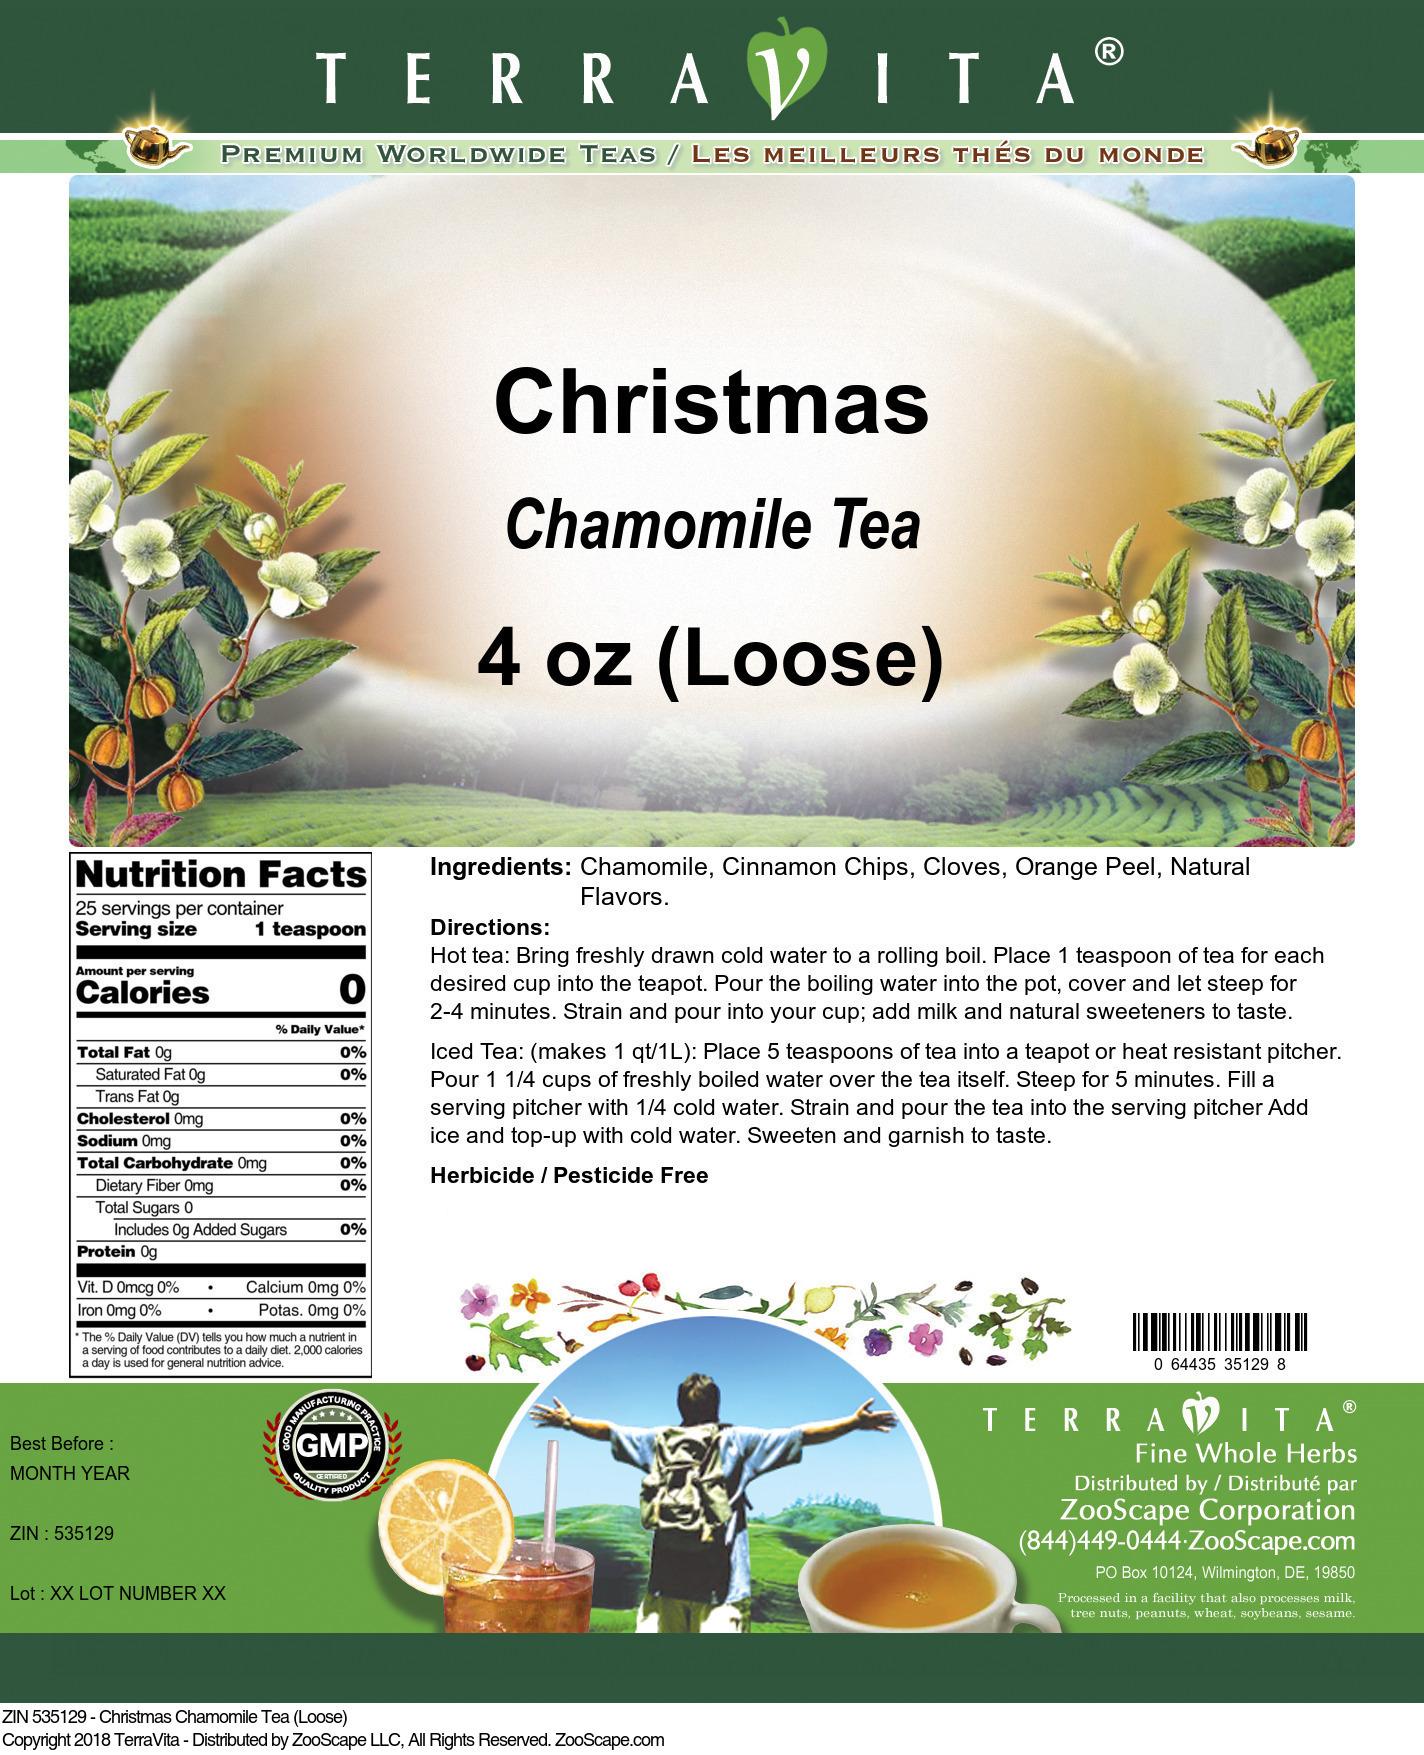 Christmas Chamomile Tea (Loose)